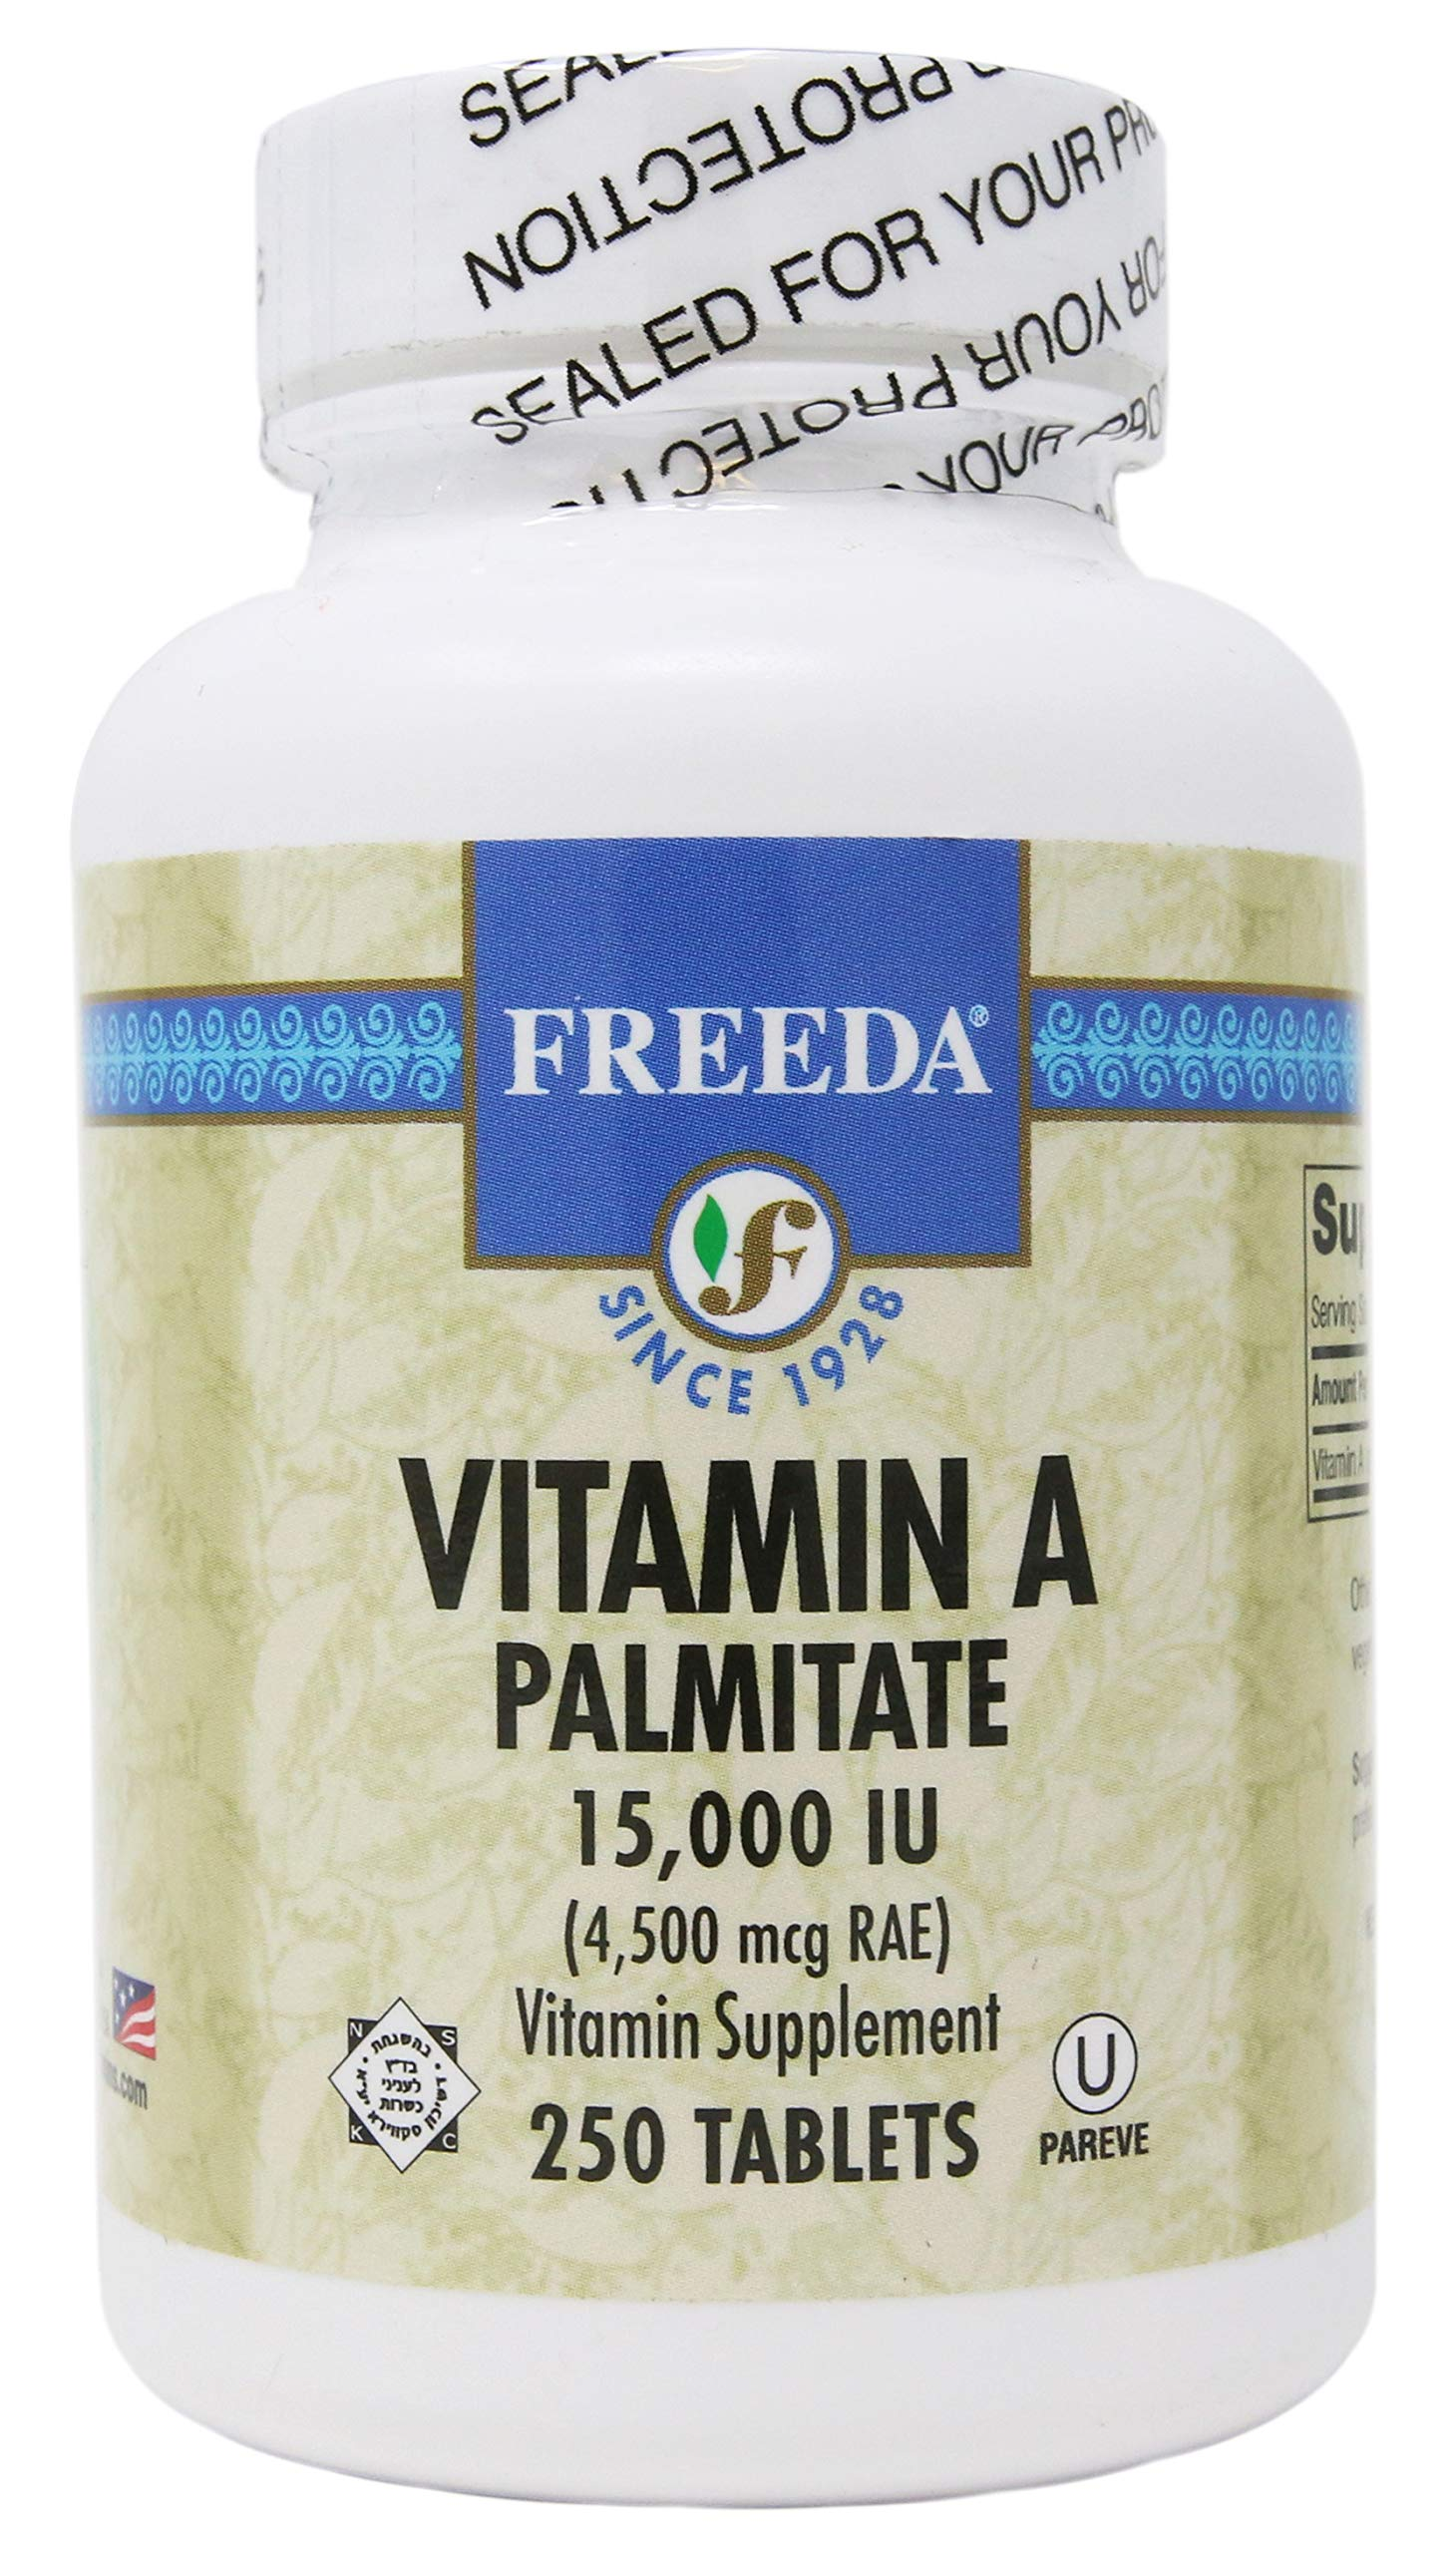 Freeda Kosher Vitamin A Palmitate 15,000 I.U. - 250 TABLETS by Freeda